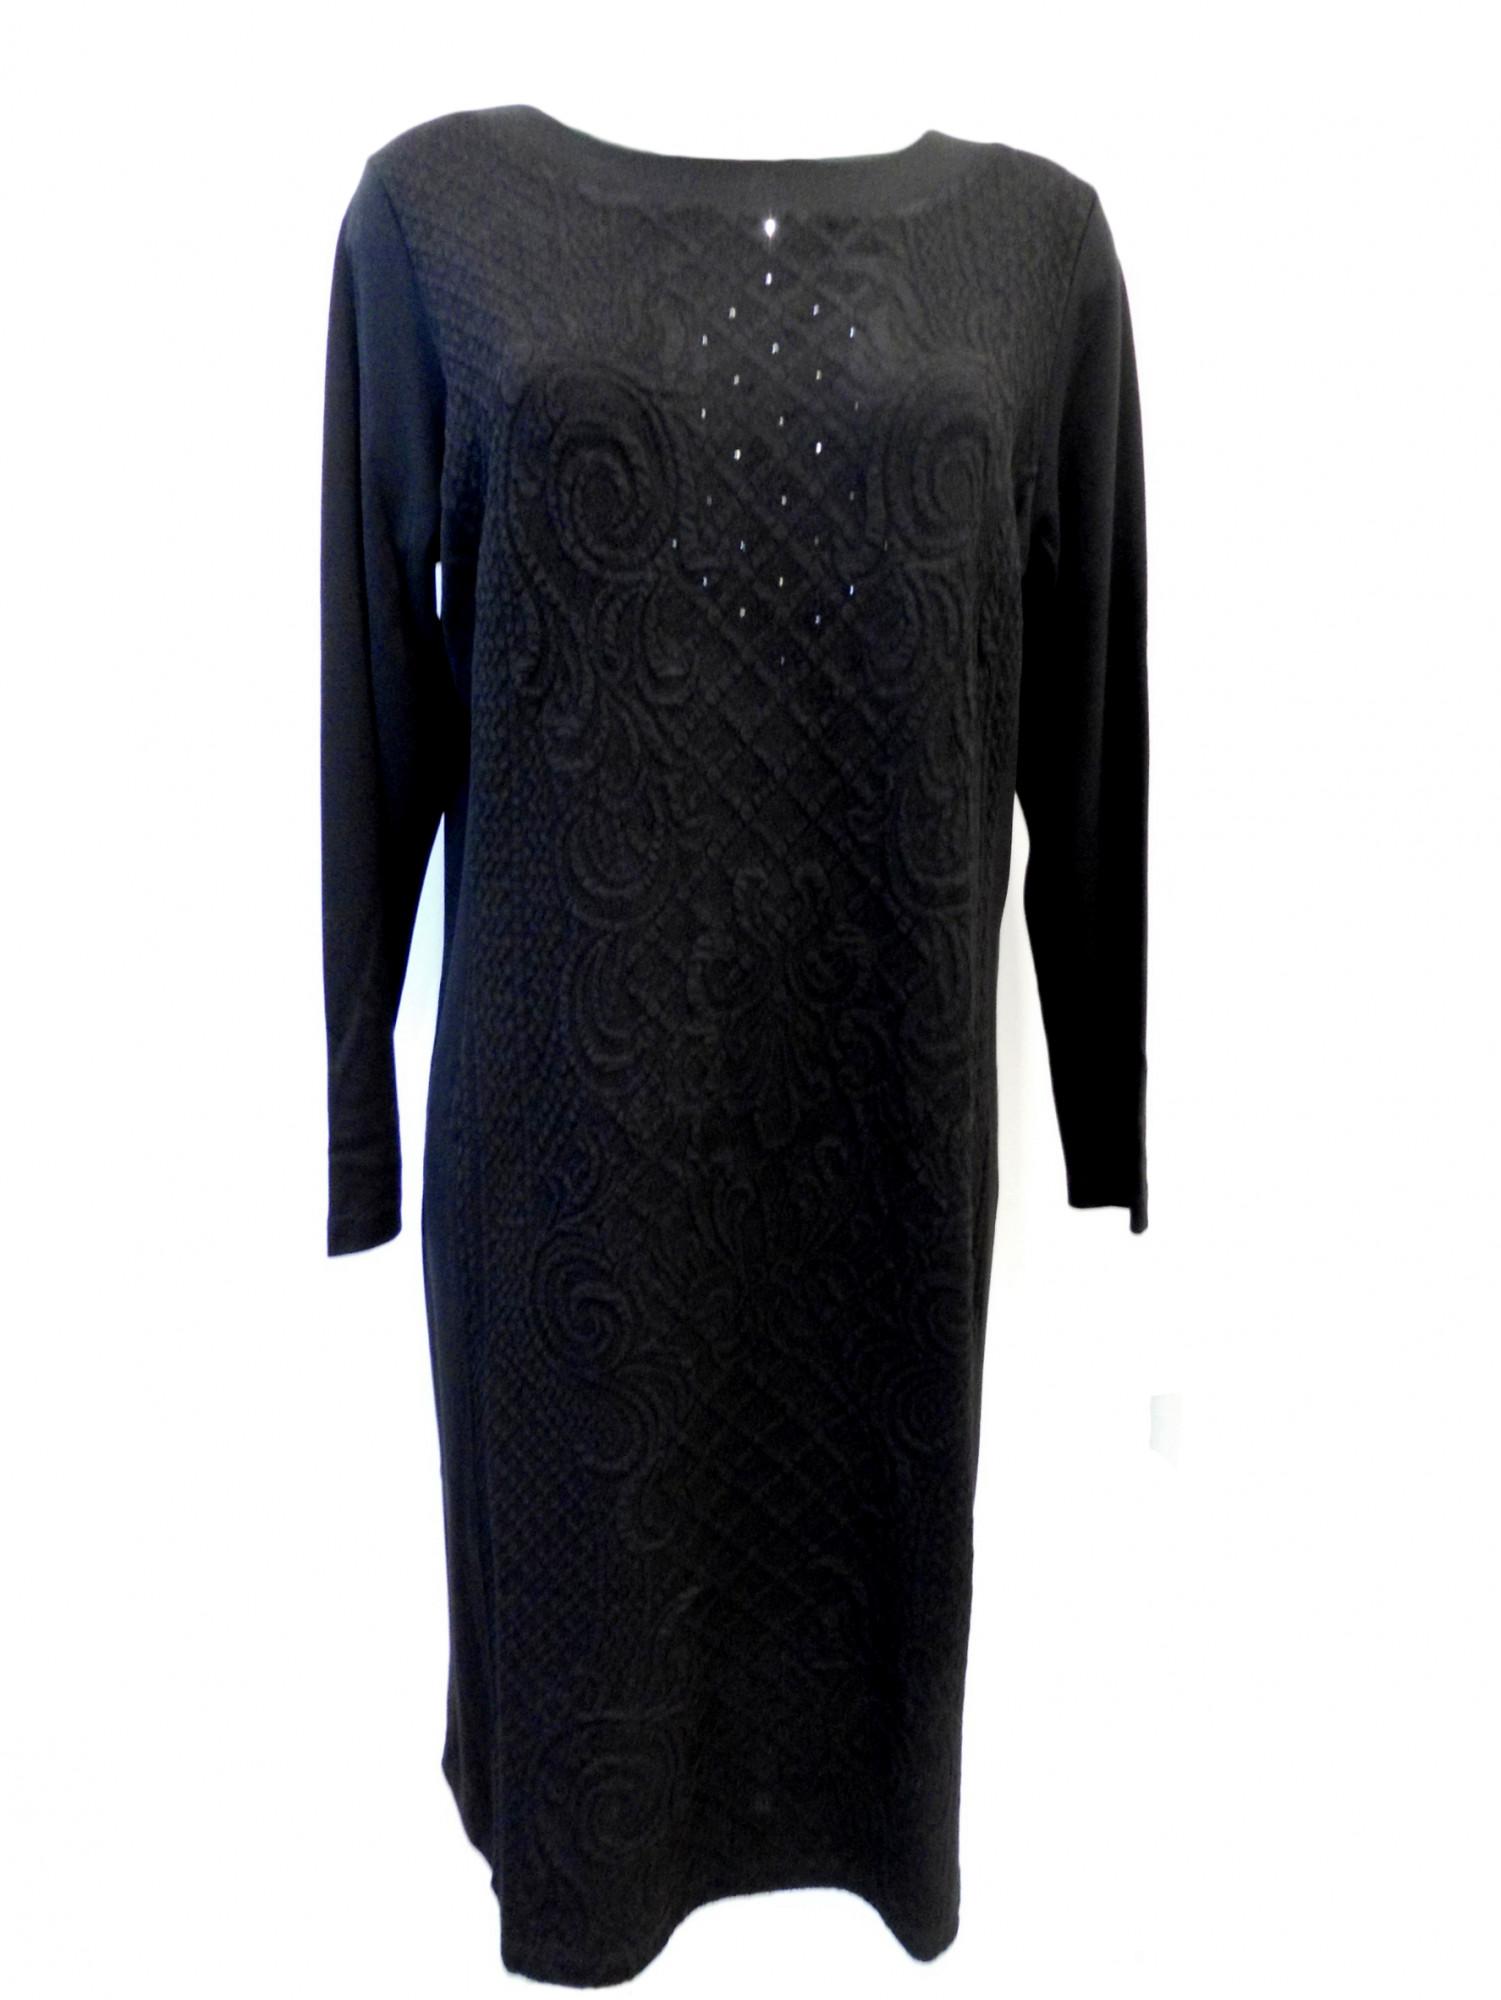 Dámské šaty VAF DR - Favab Barva: černá, Velikost: XL